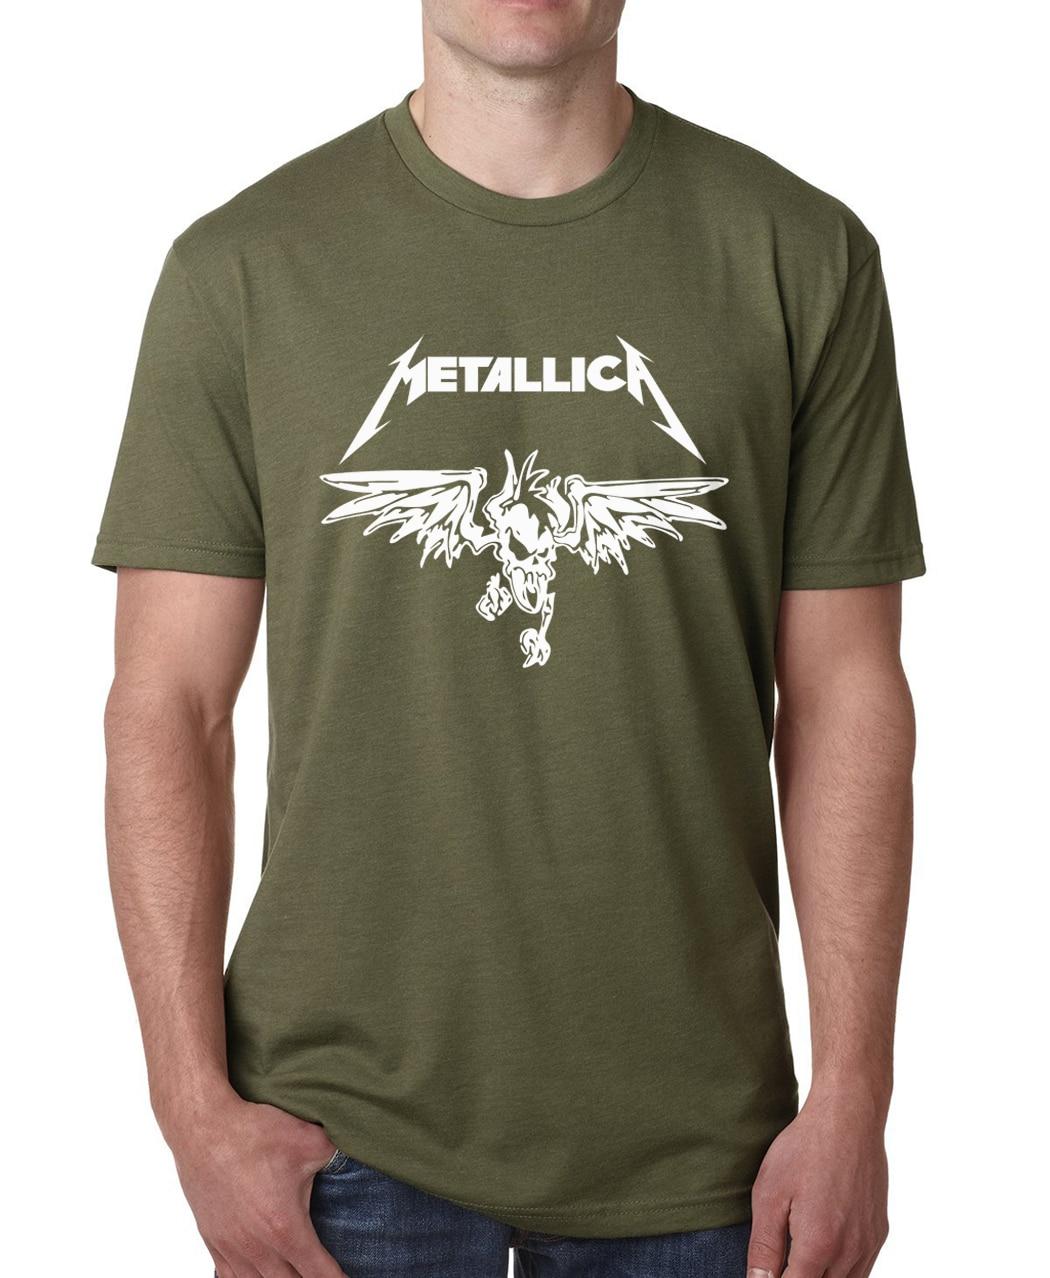 Metallica band classic heavy metal rock t shirt 2017 men for Thick t shirts brands